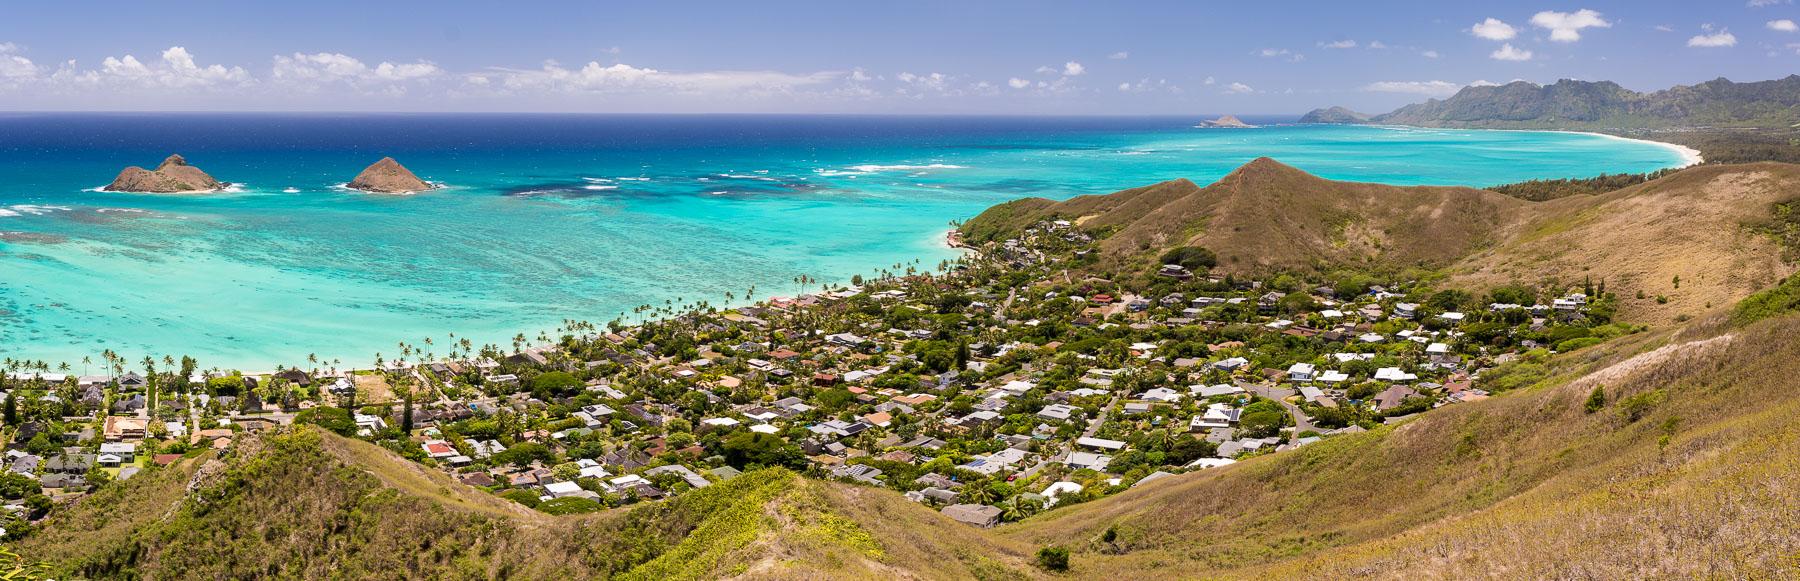 Havajská panoramata